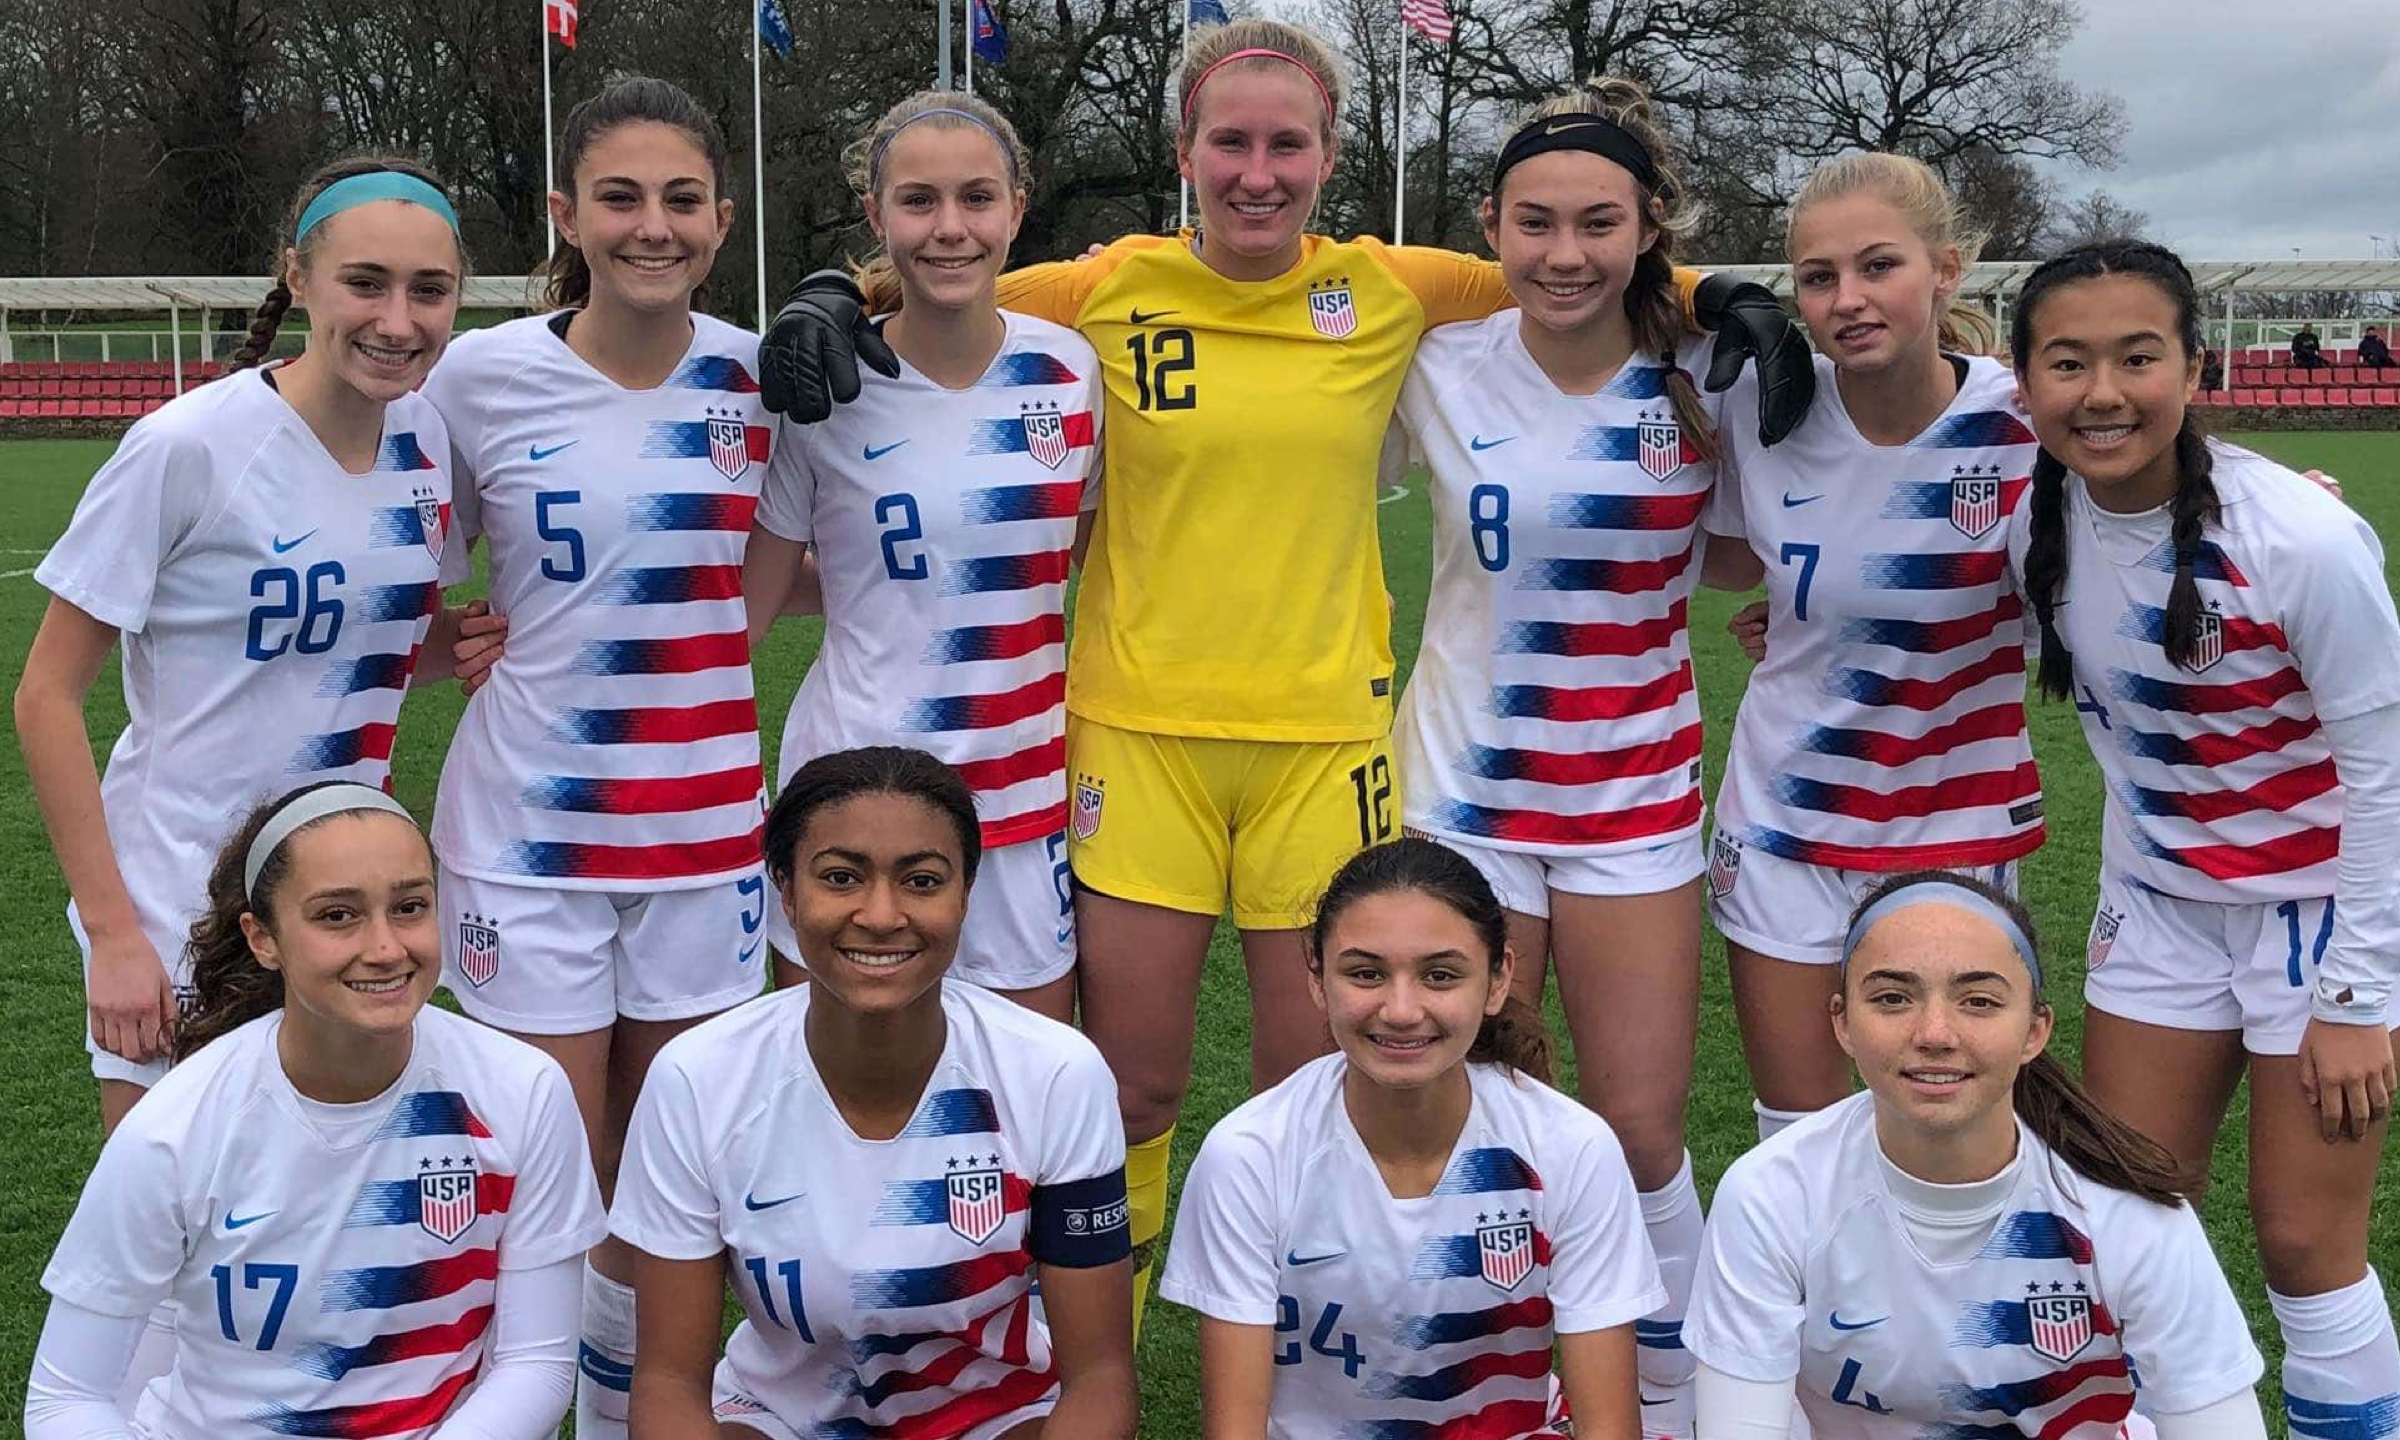 U-16 GIRLS' NATIONAL TEAM